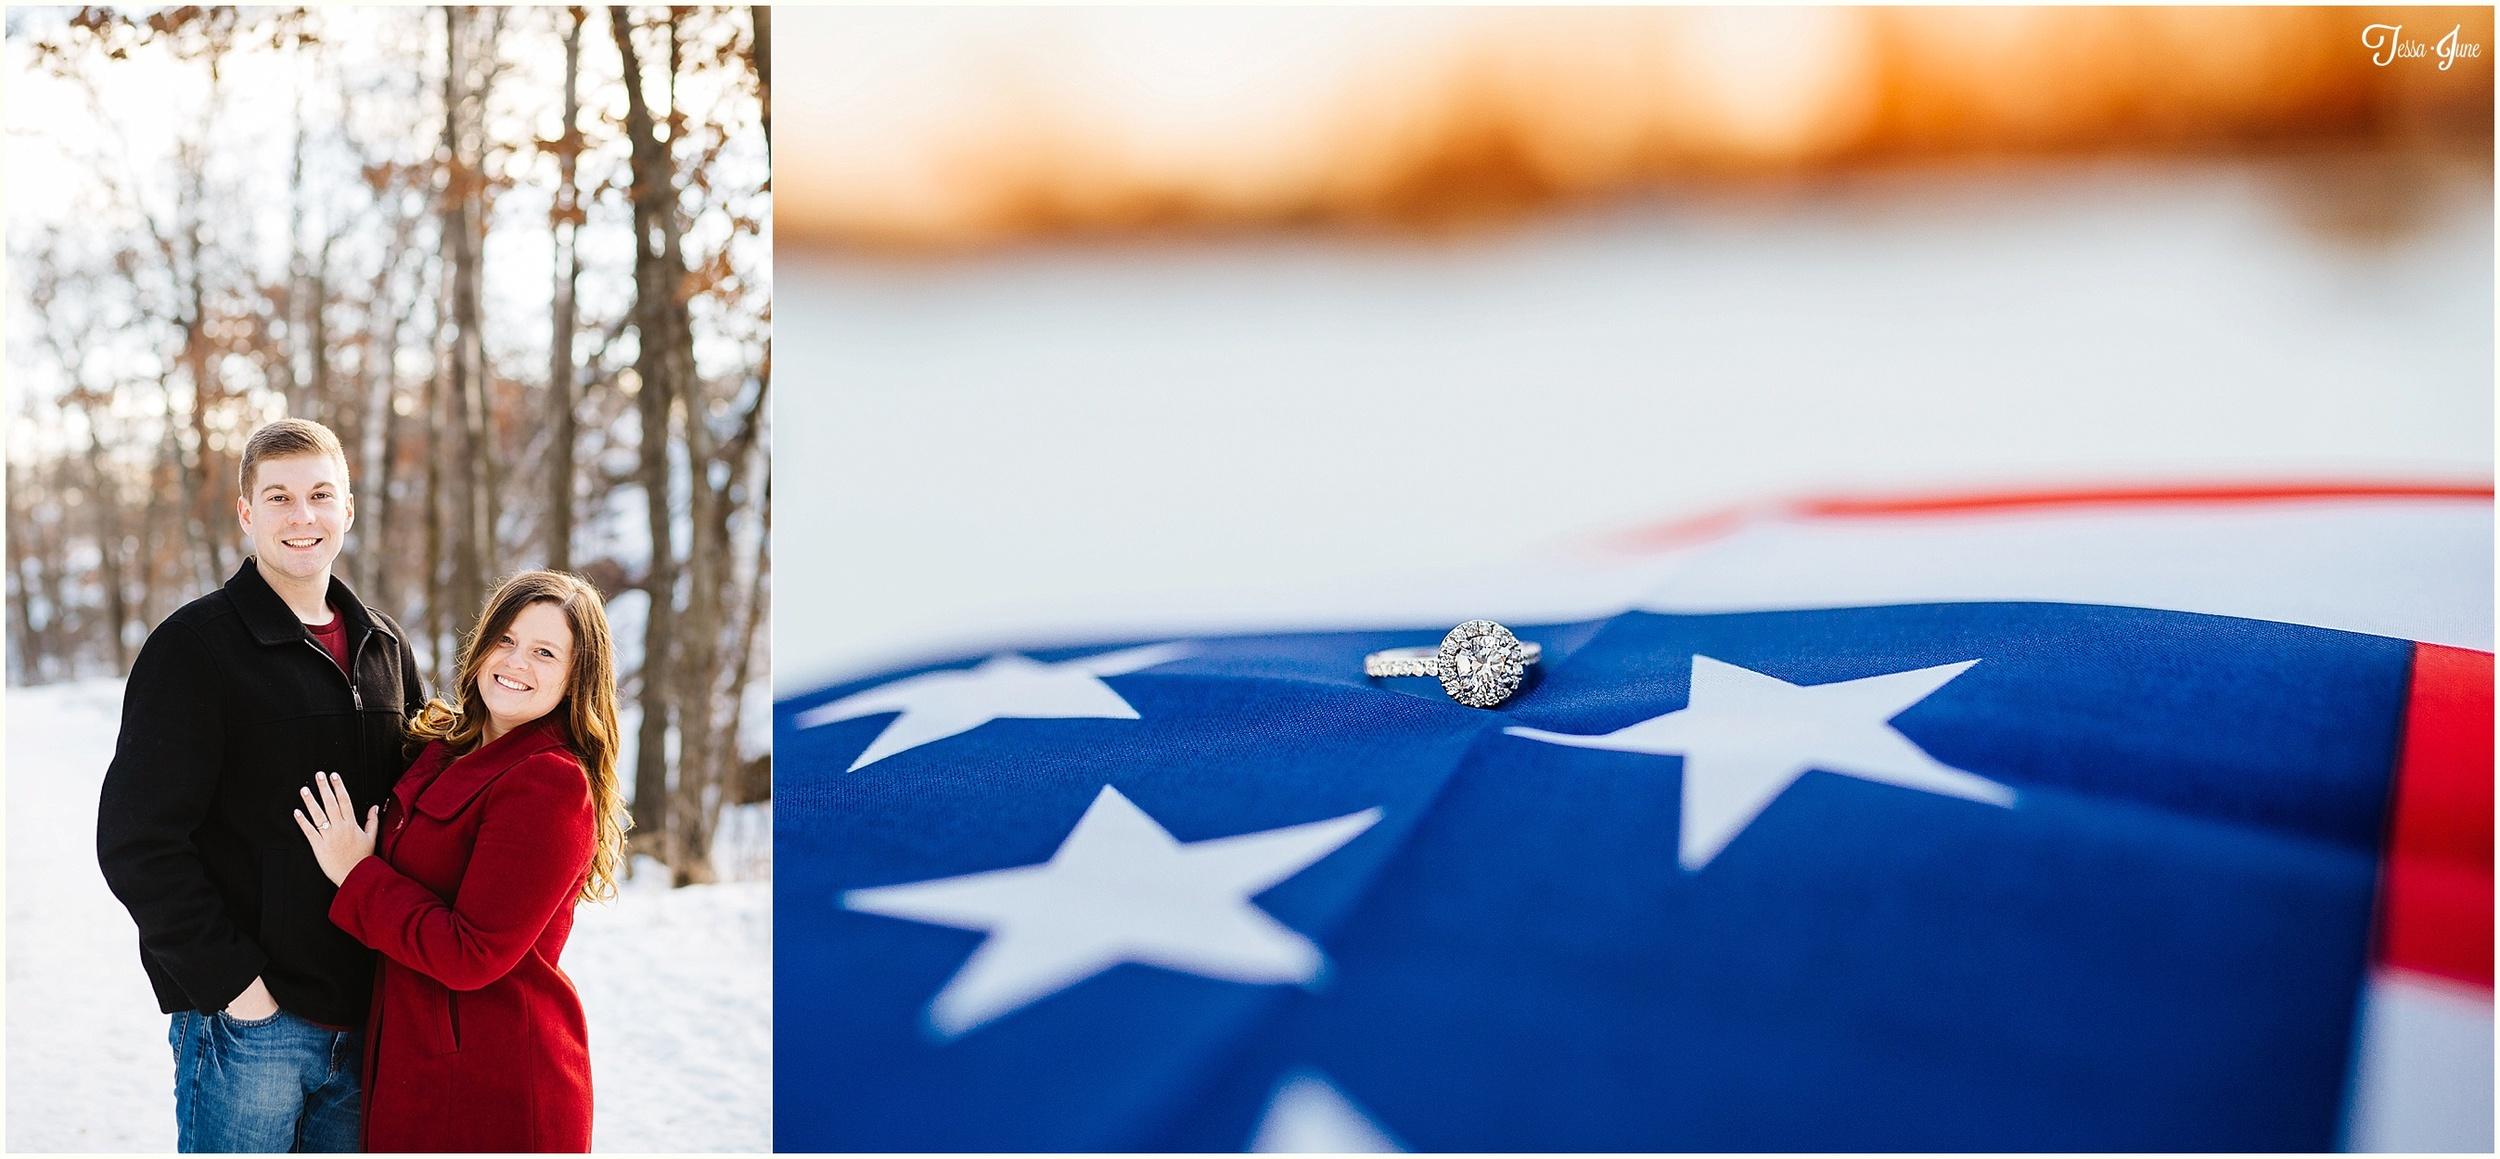 st-cloud-minnesota-wedding-photographer-waite-park-quarry-winter